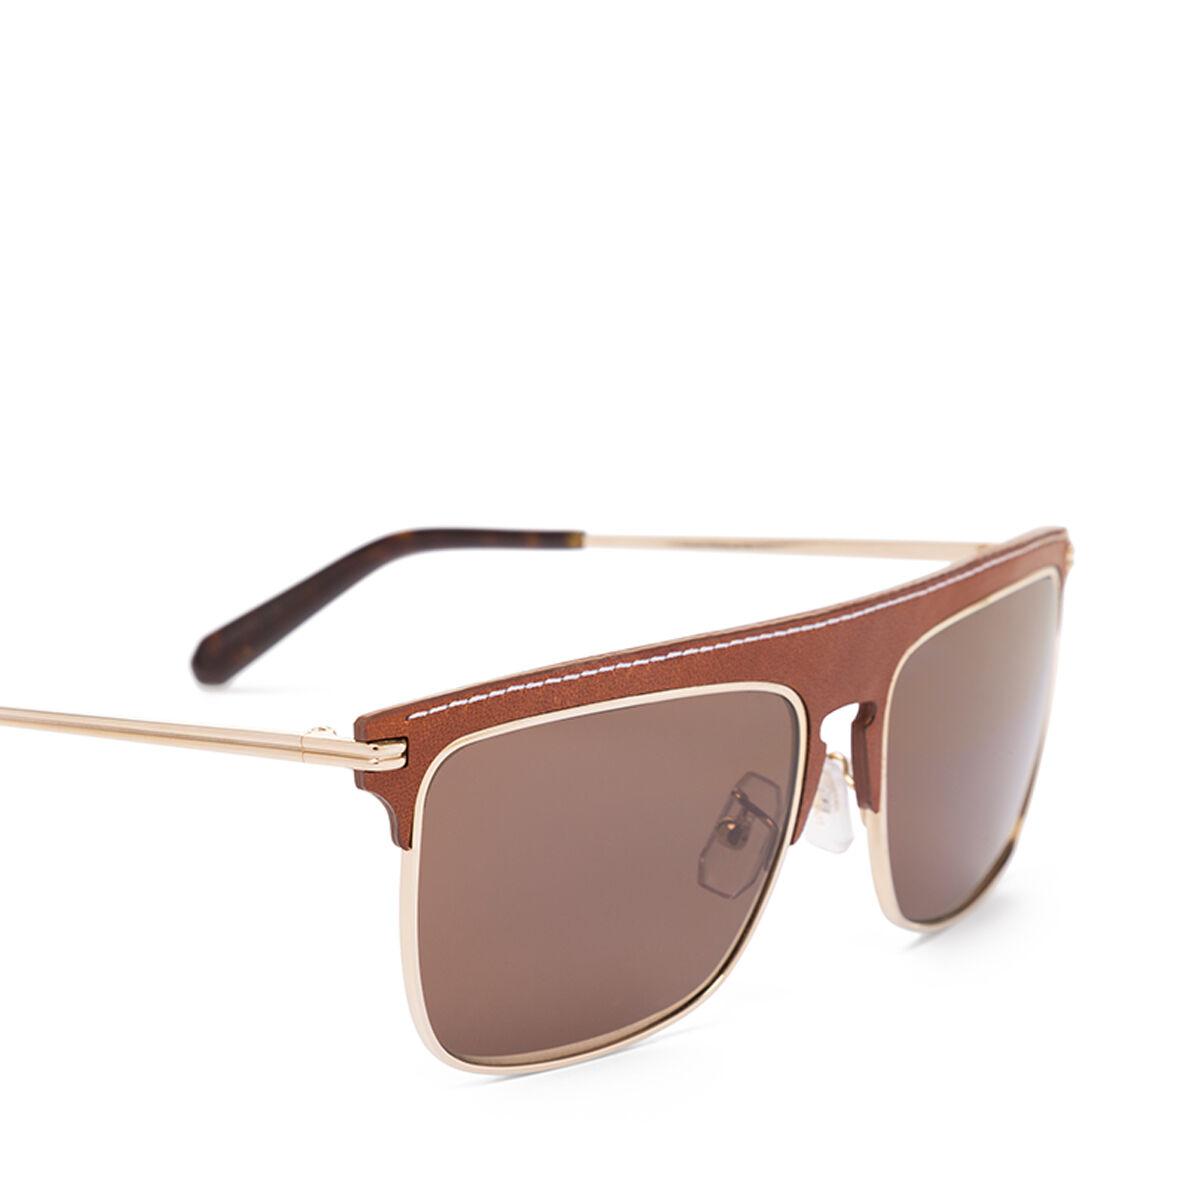 LOEWE Square Sunglasses Brown/Dark Brown front